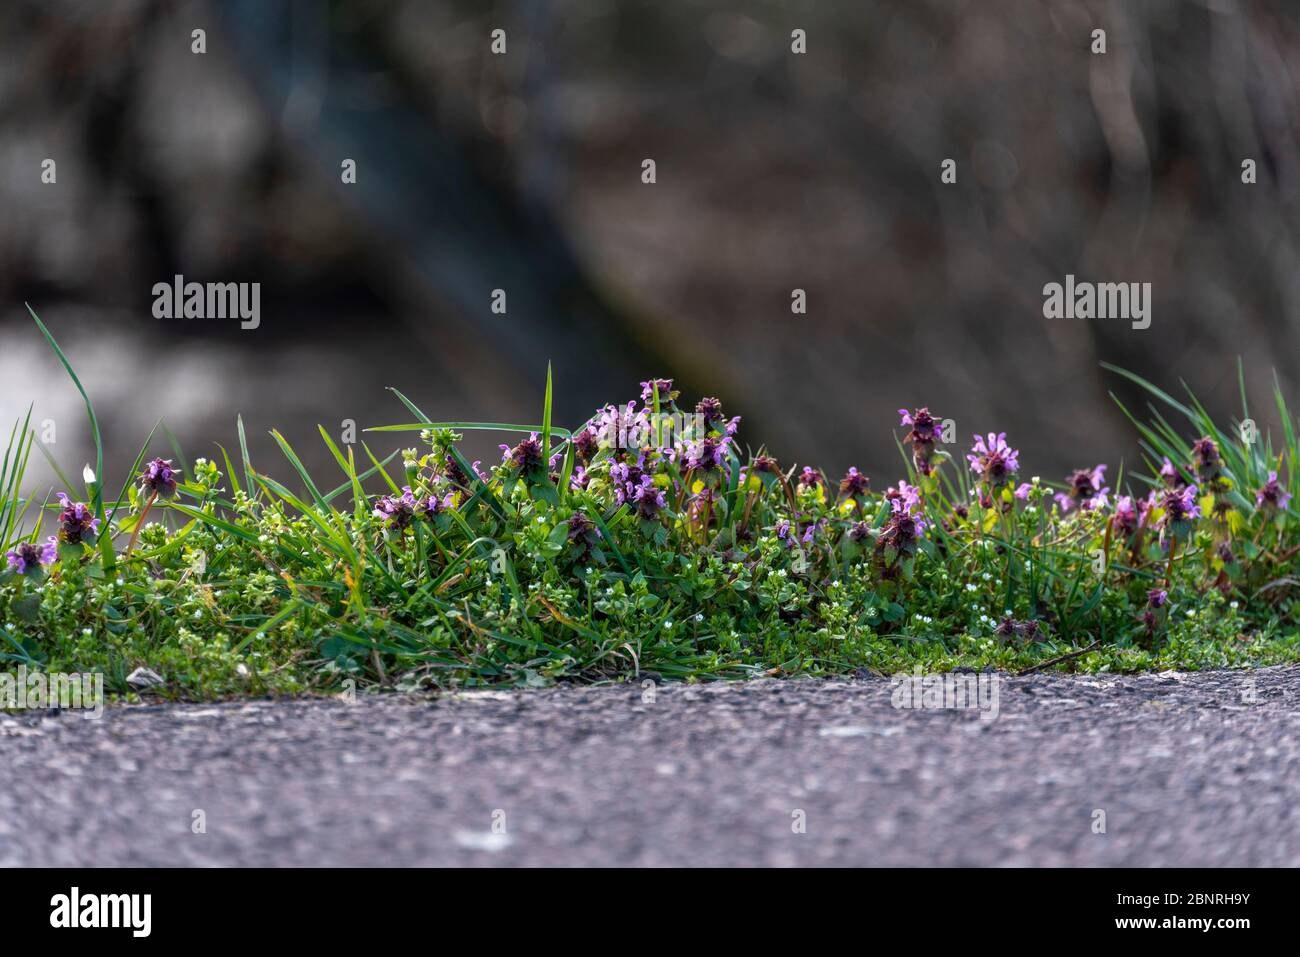 Little Braunelle on the roadside, Prunella vulgaris Stock Photo